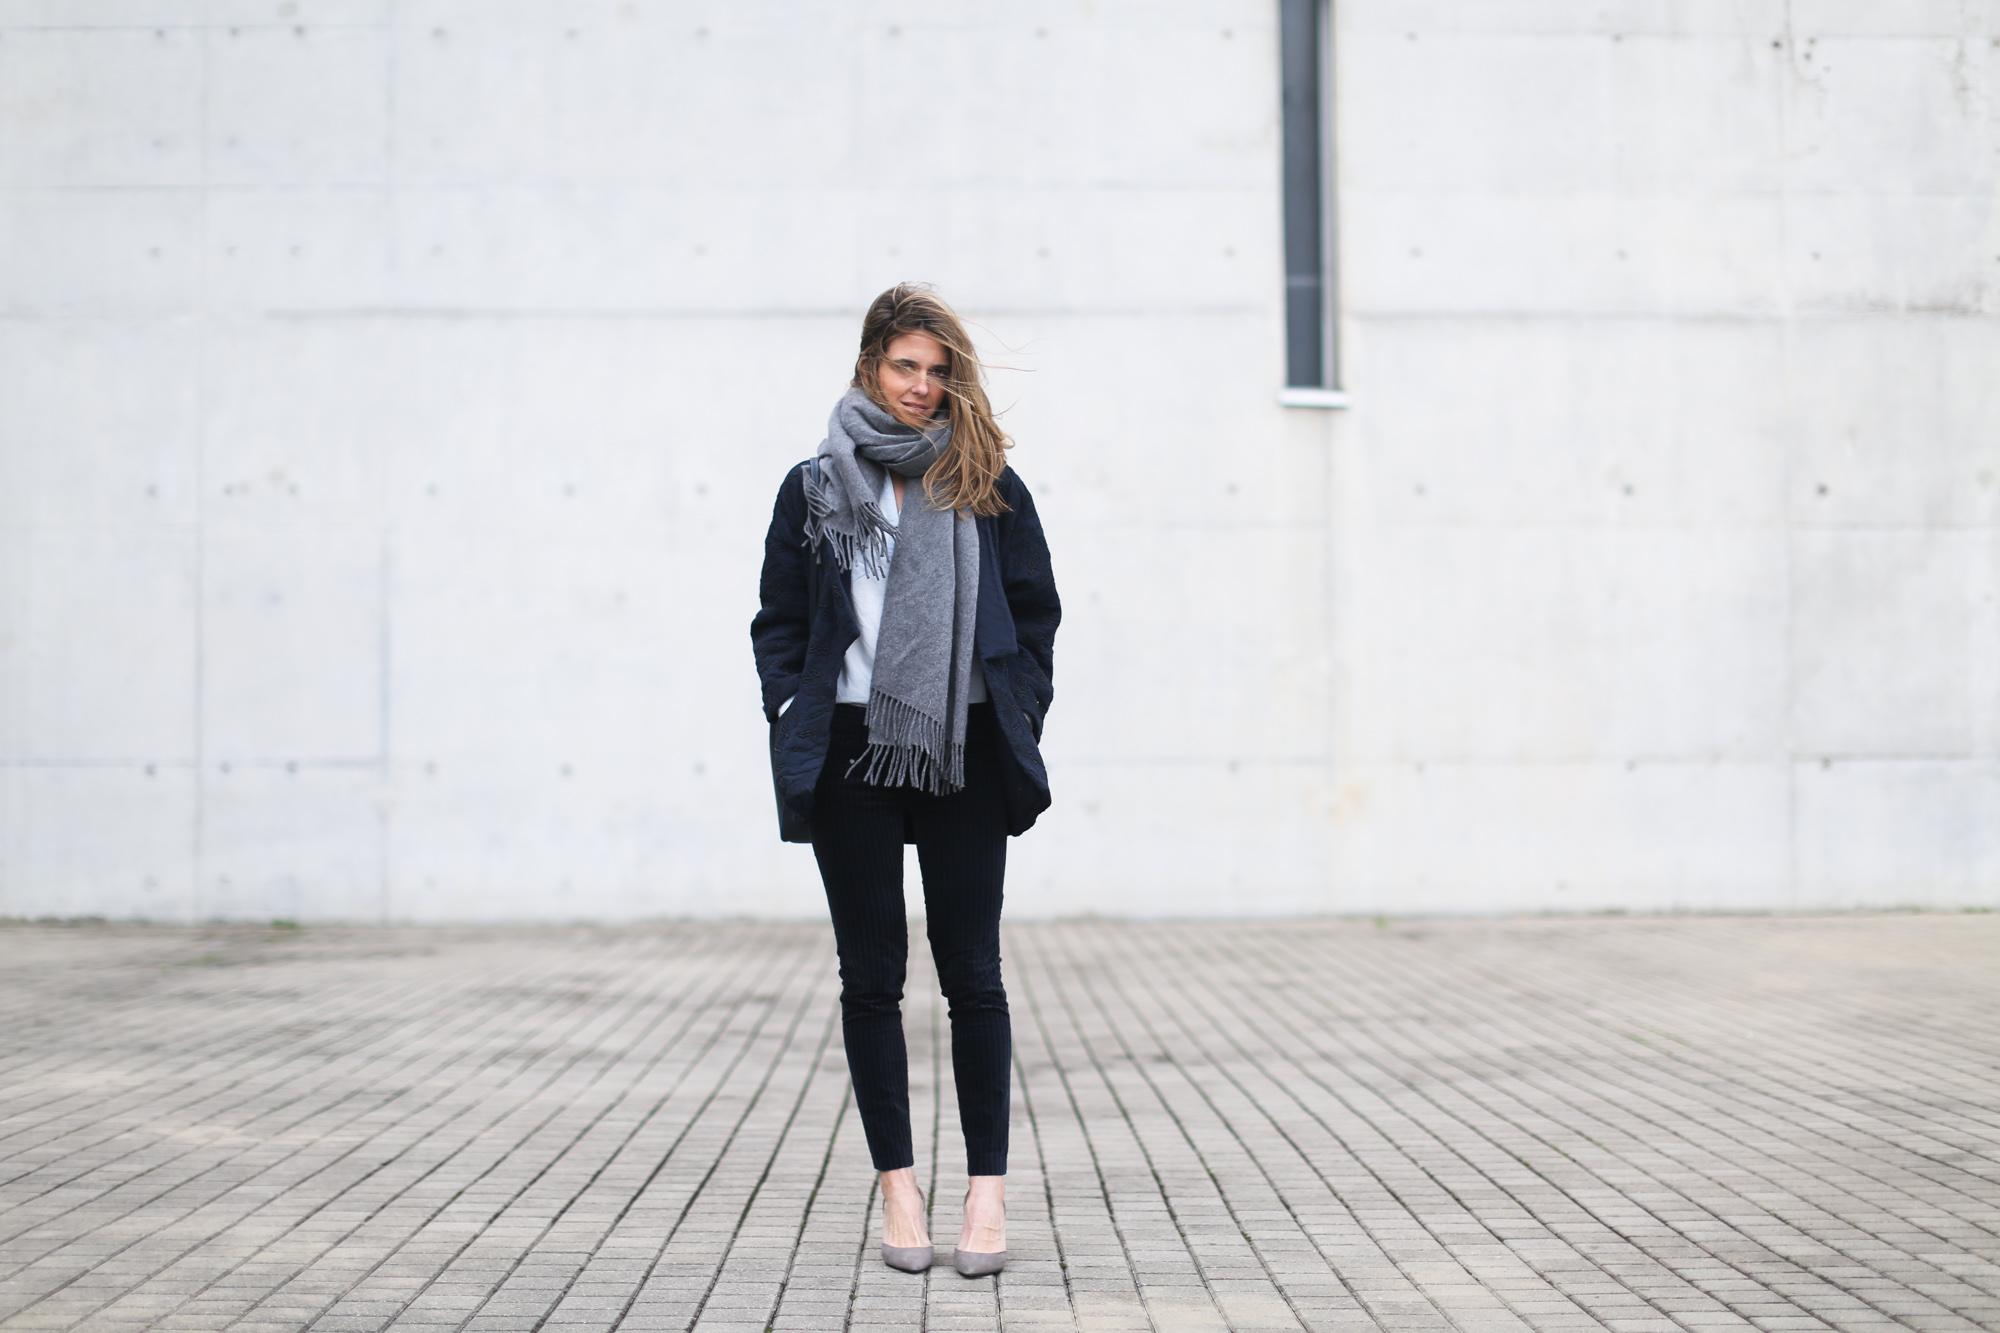 clochet_streetstyle_embroided_kimono_jacket_purificacion_garcia_bucket_bag-3